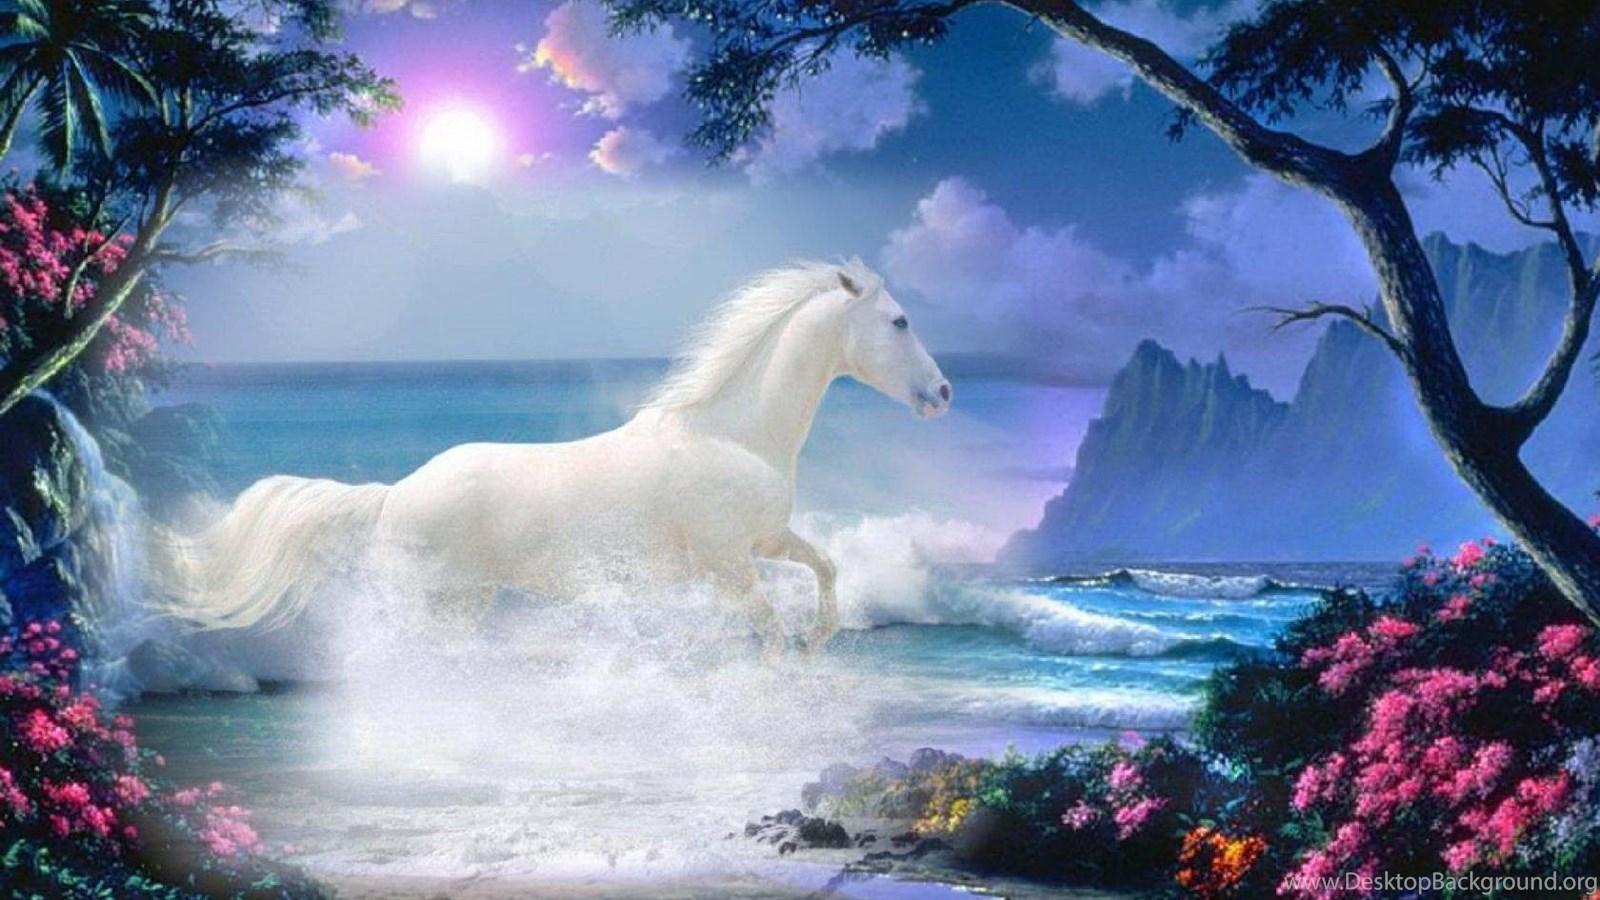 Beautiful White Horse Wallpaper Desktop Background